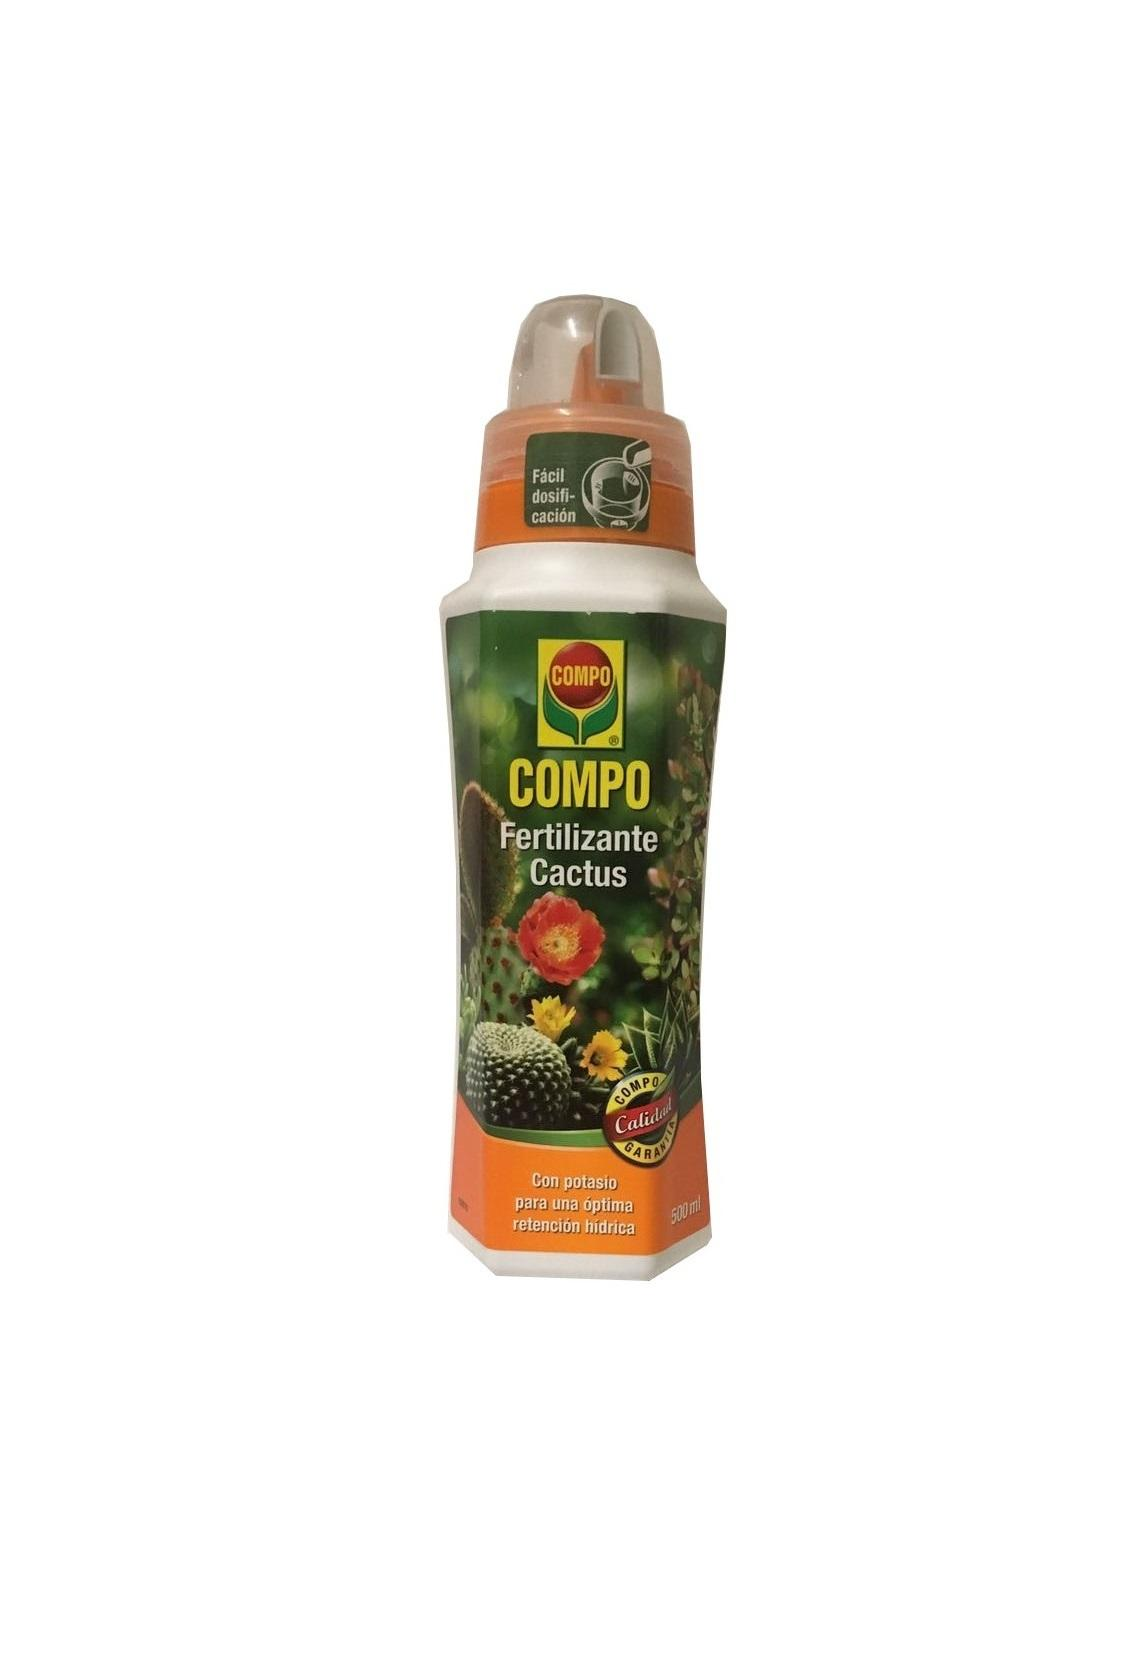 Fertilizante liquido para cactus Compo 500ml